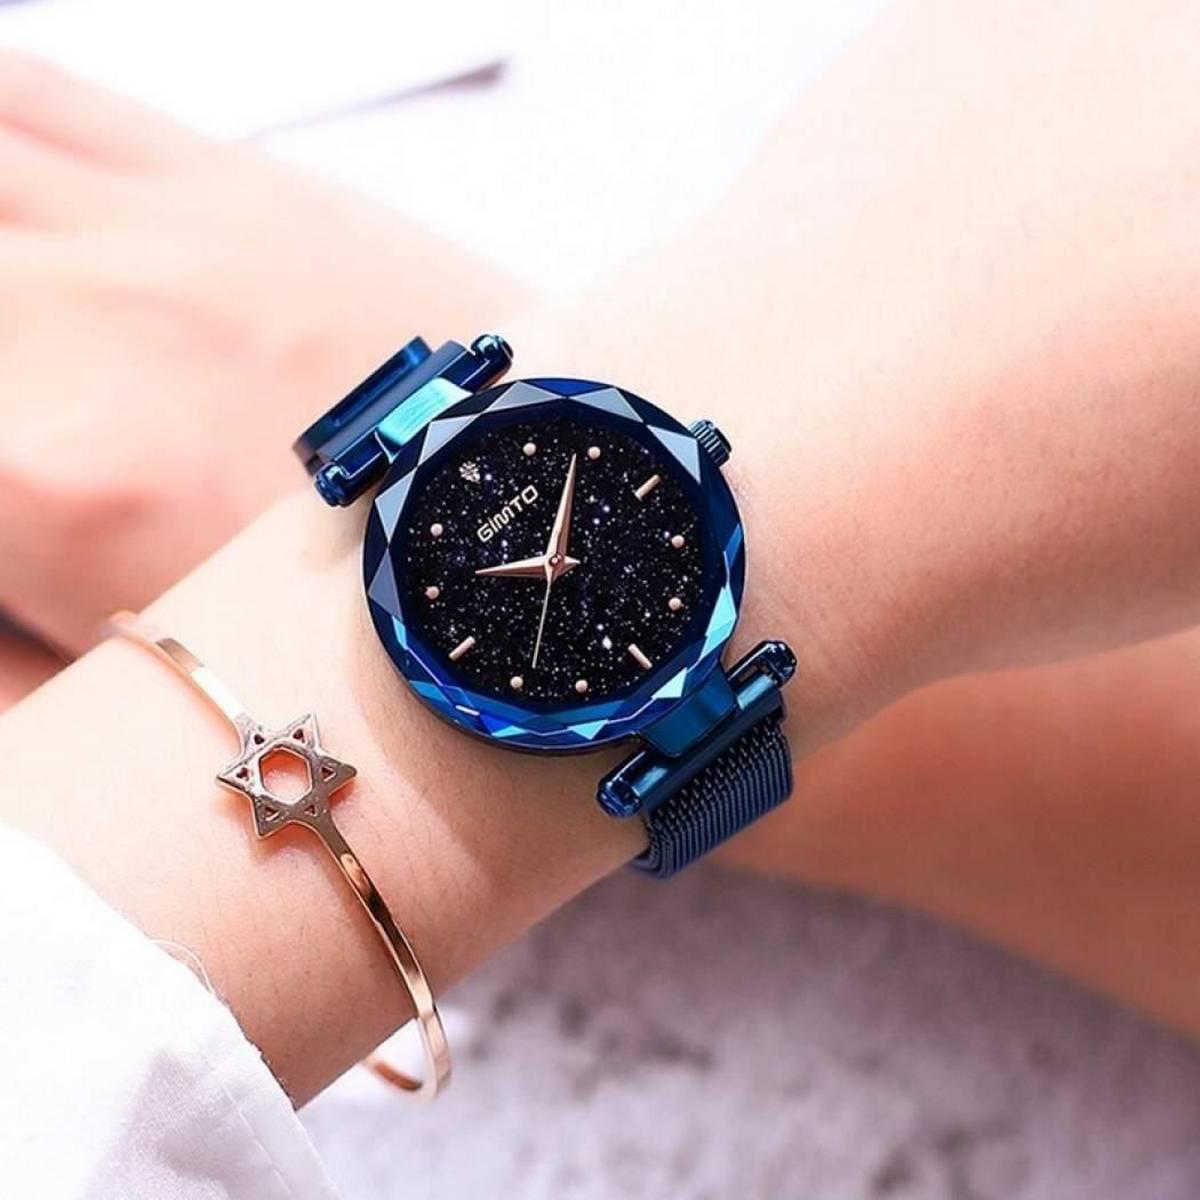 WaterProof Fashion Ladies Watch Magnet Clasp Adjusting Strap Beautiful Elegant Women'S Watch Women Luxury Wrist Watches